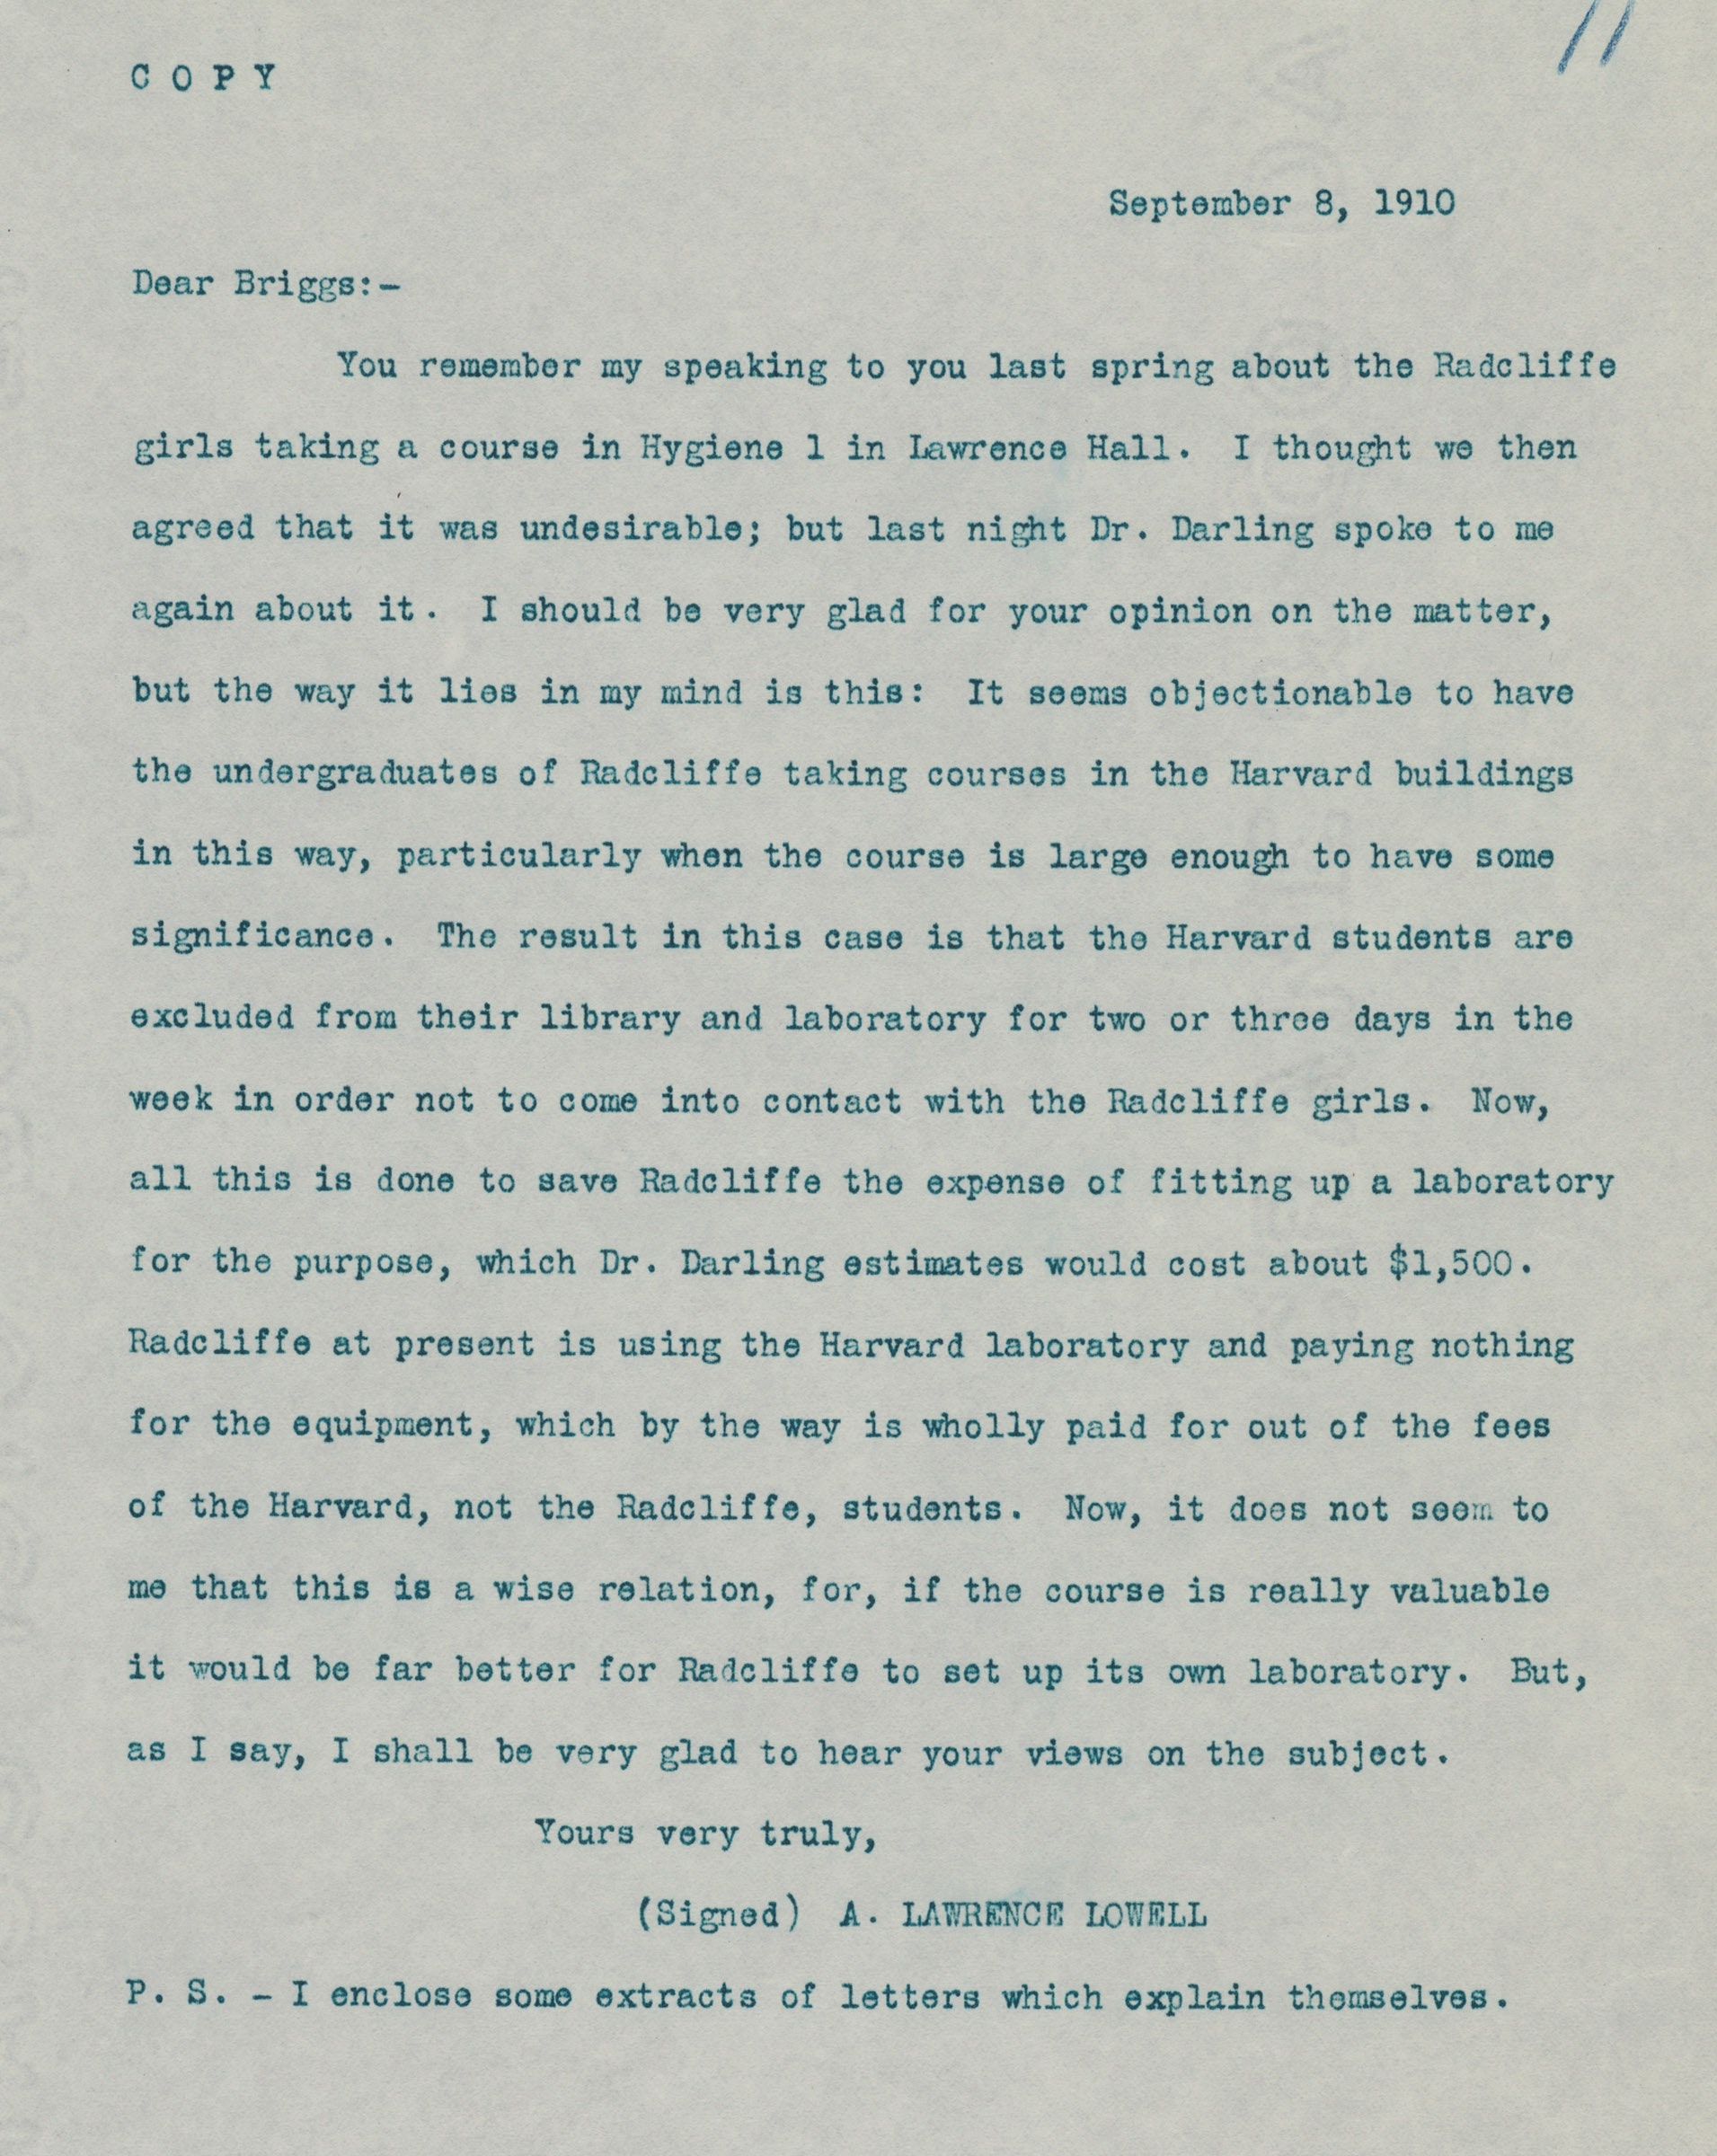 Letter regarding women students